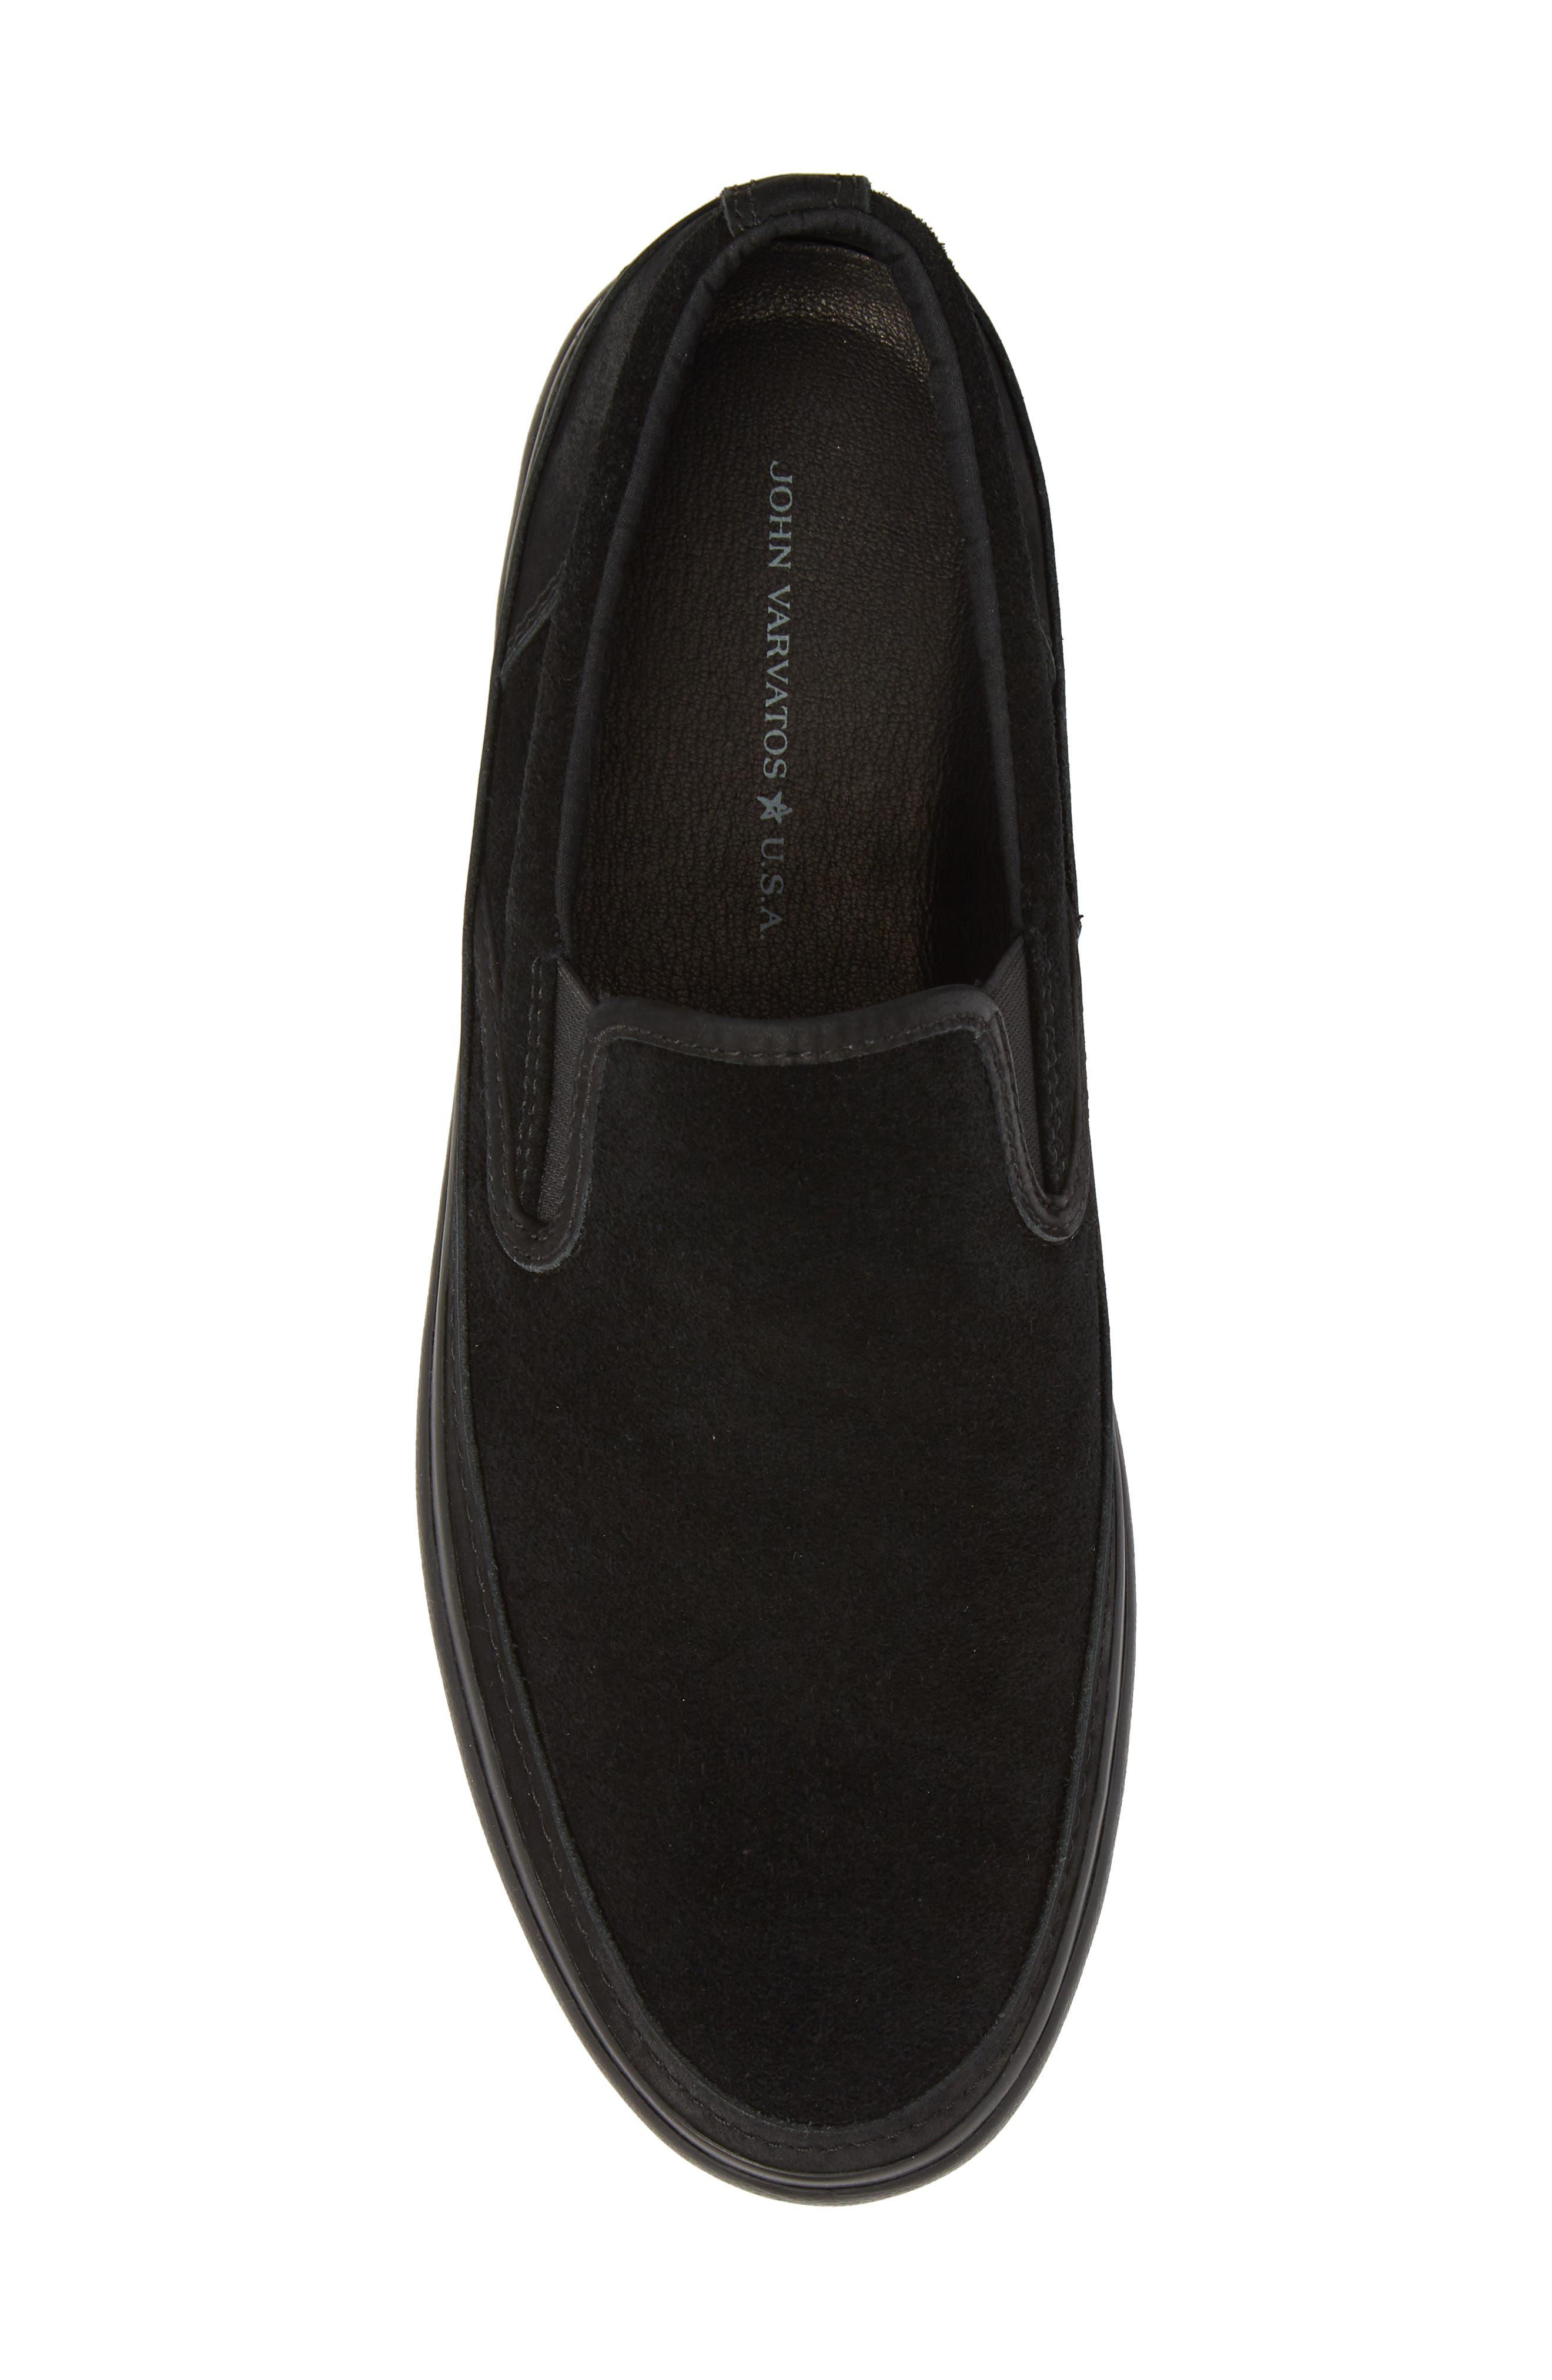 Suede Jet Slip-On Sneaker,                             Alternate thumbnail 5, color,                             BLACK SUEDE